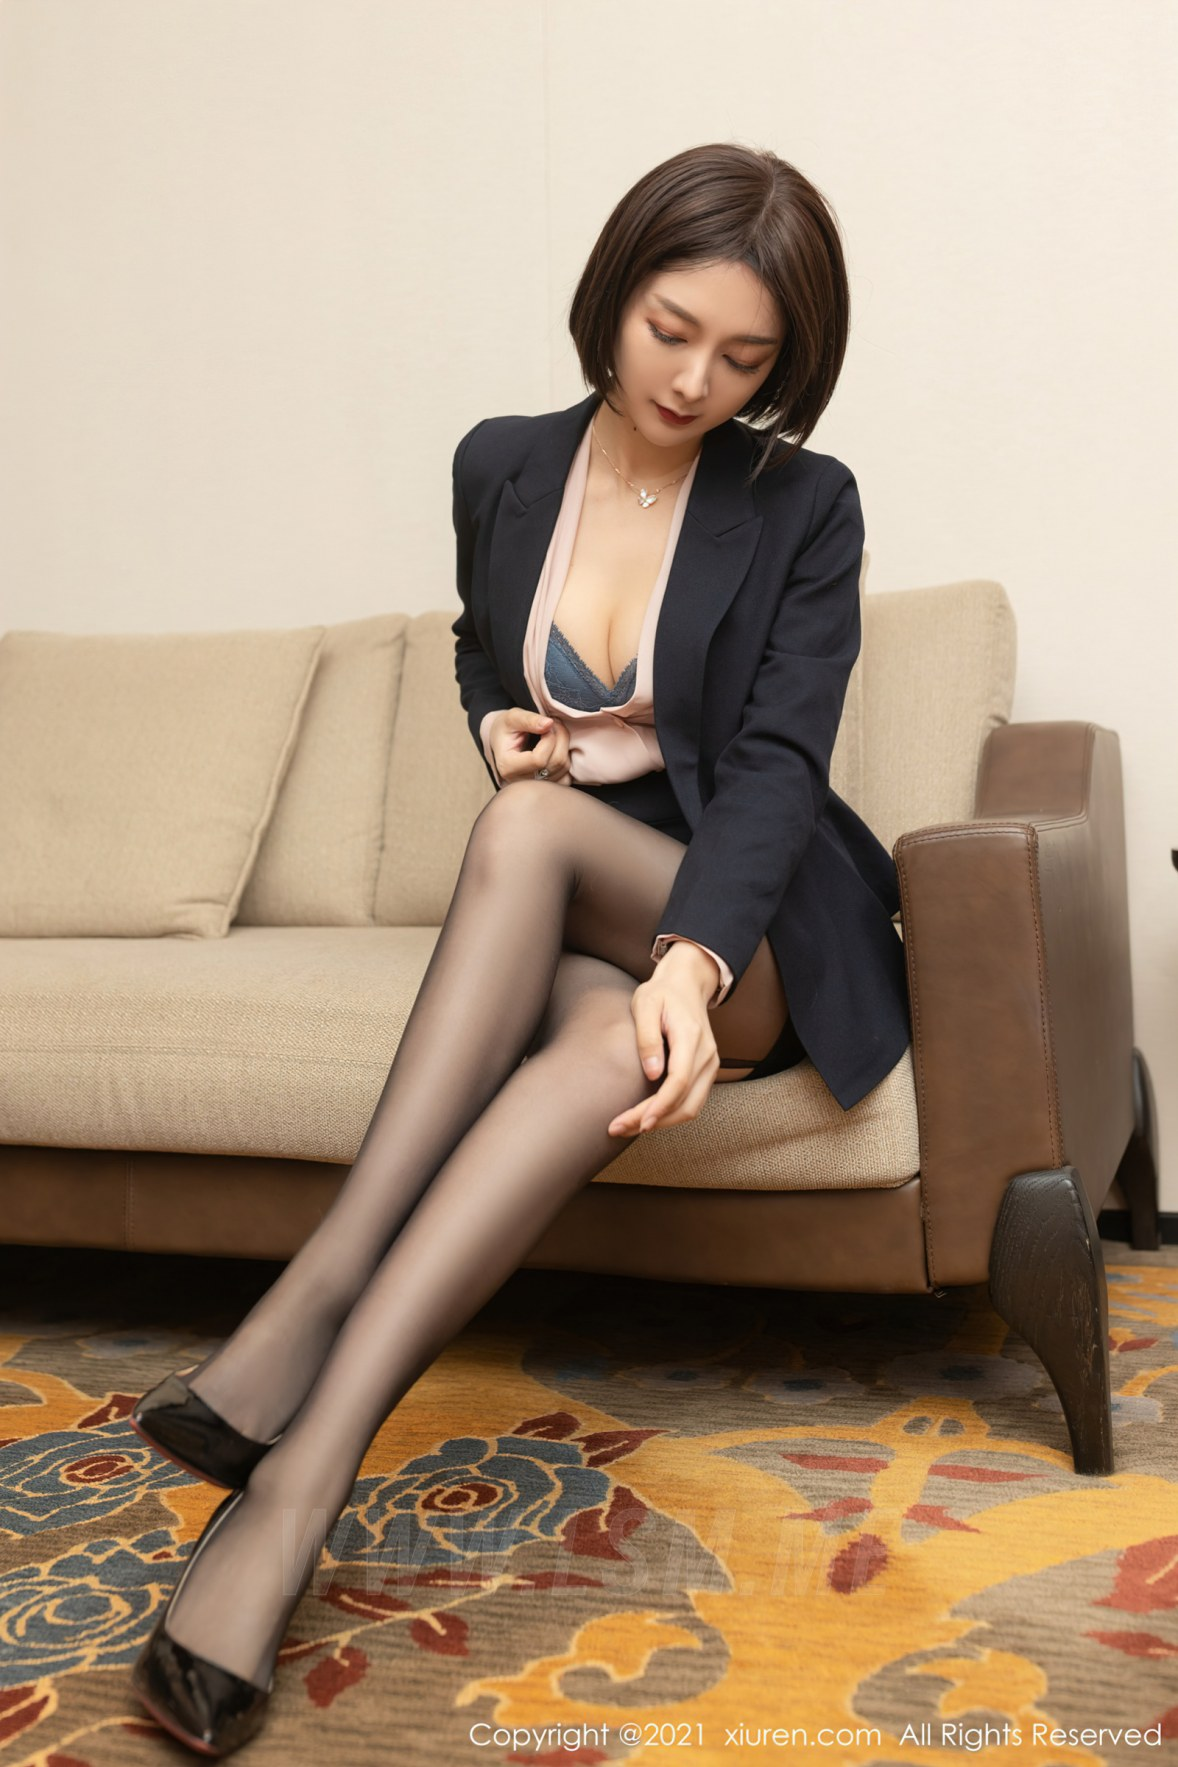 3745 023 bwy 3600 5400 - XiuRen 秀人 No.3745 保险销售主题 Angela小热巴 性感写真33 - 秀人网 -【免费在线写真】【丽人丝语】